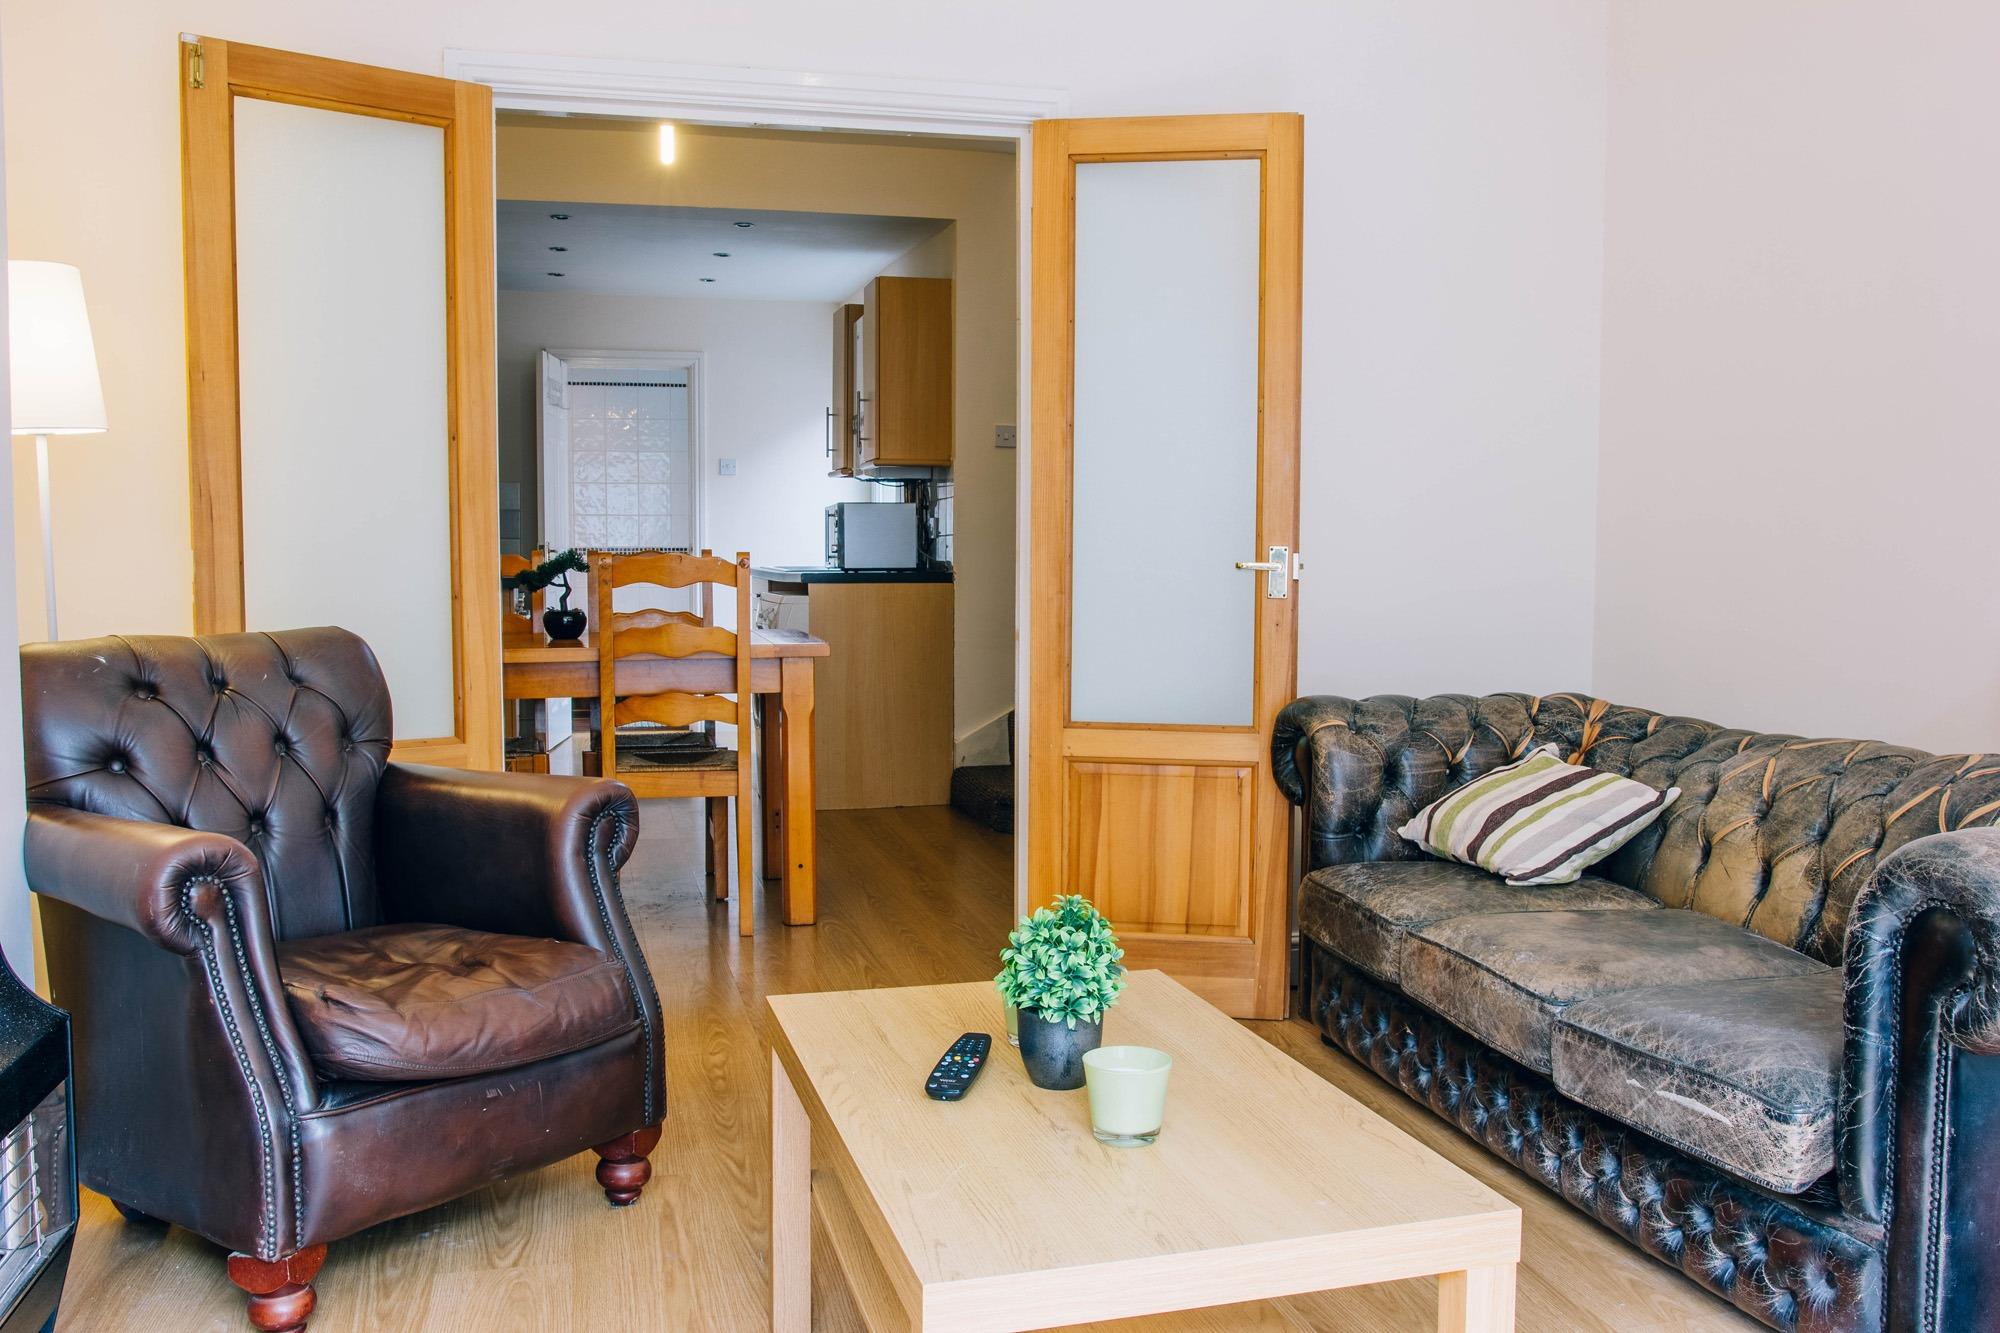 student accommodation rental hull, student accommodation lets hull, student accommodation hull